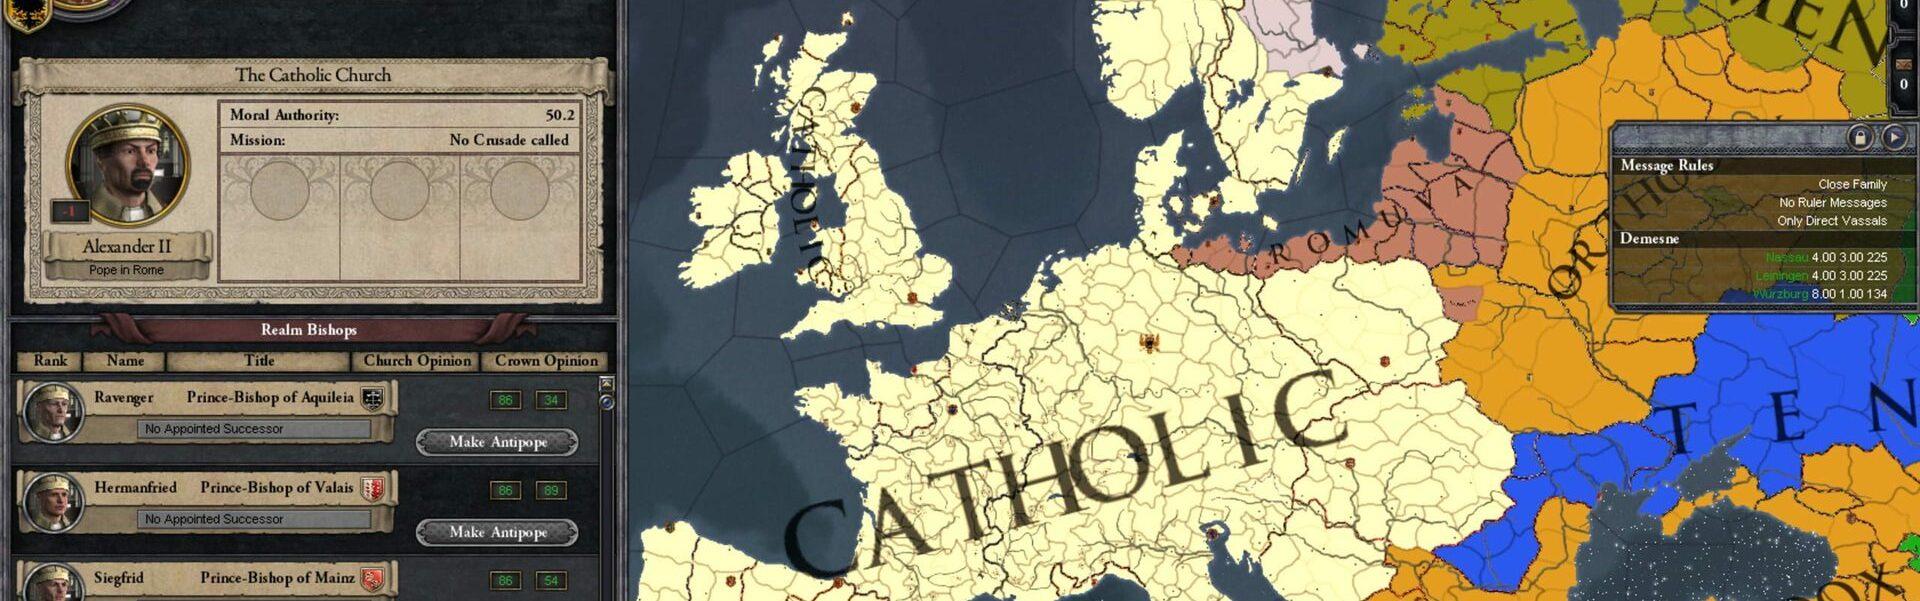 Crusader Kings II - (DLC) Collection 2014 Steam Key GLOBAL